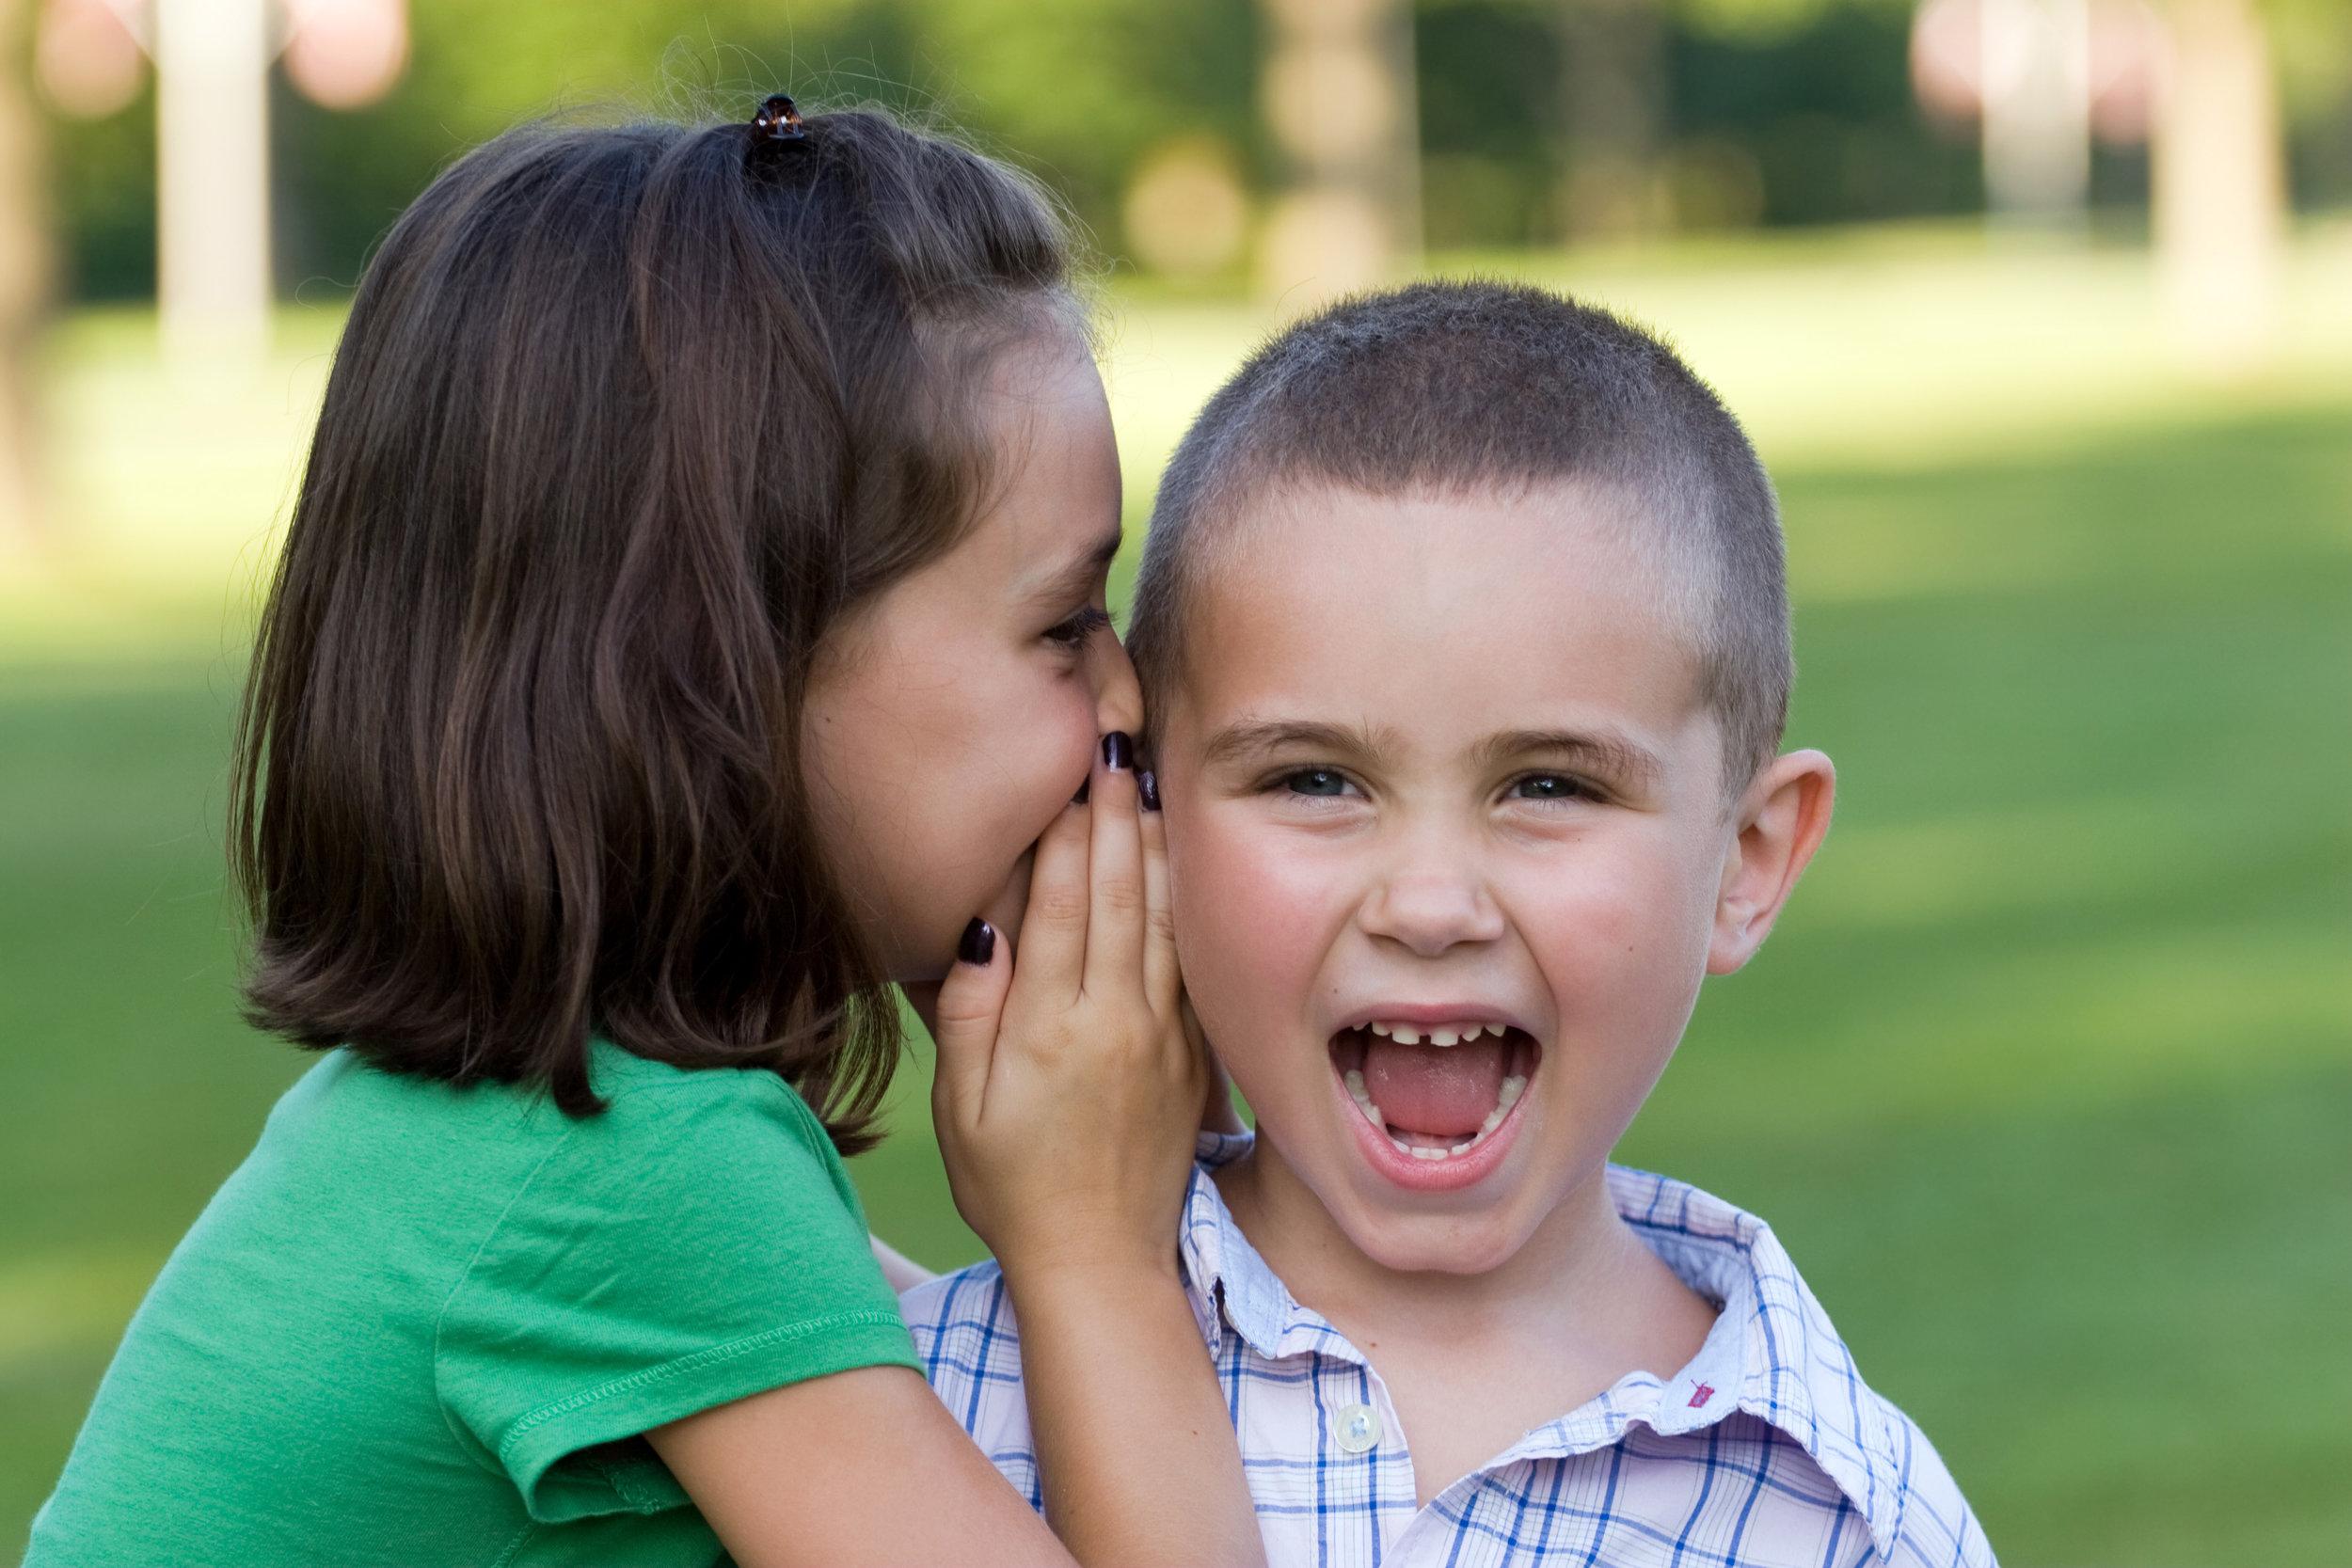 a-young-girl-telling-her-brother-a-secret_rKFsAd0Bi.jpg